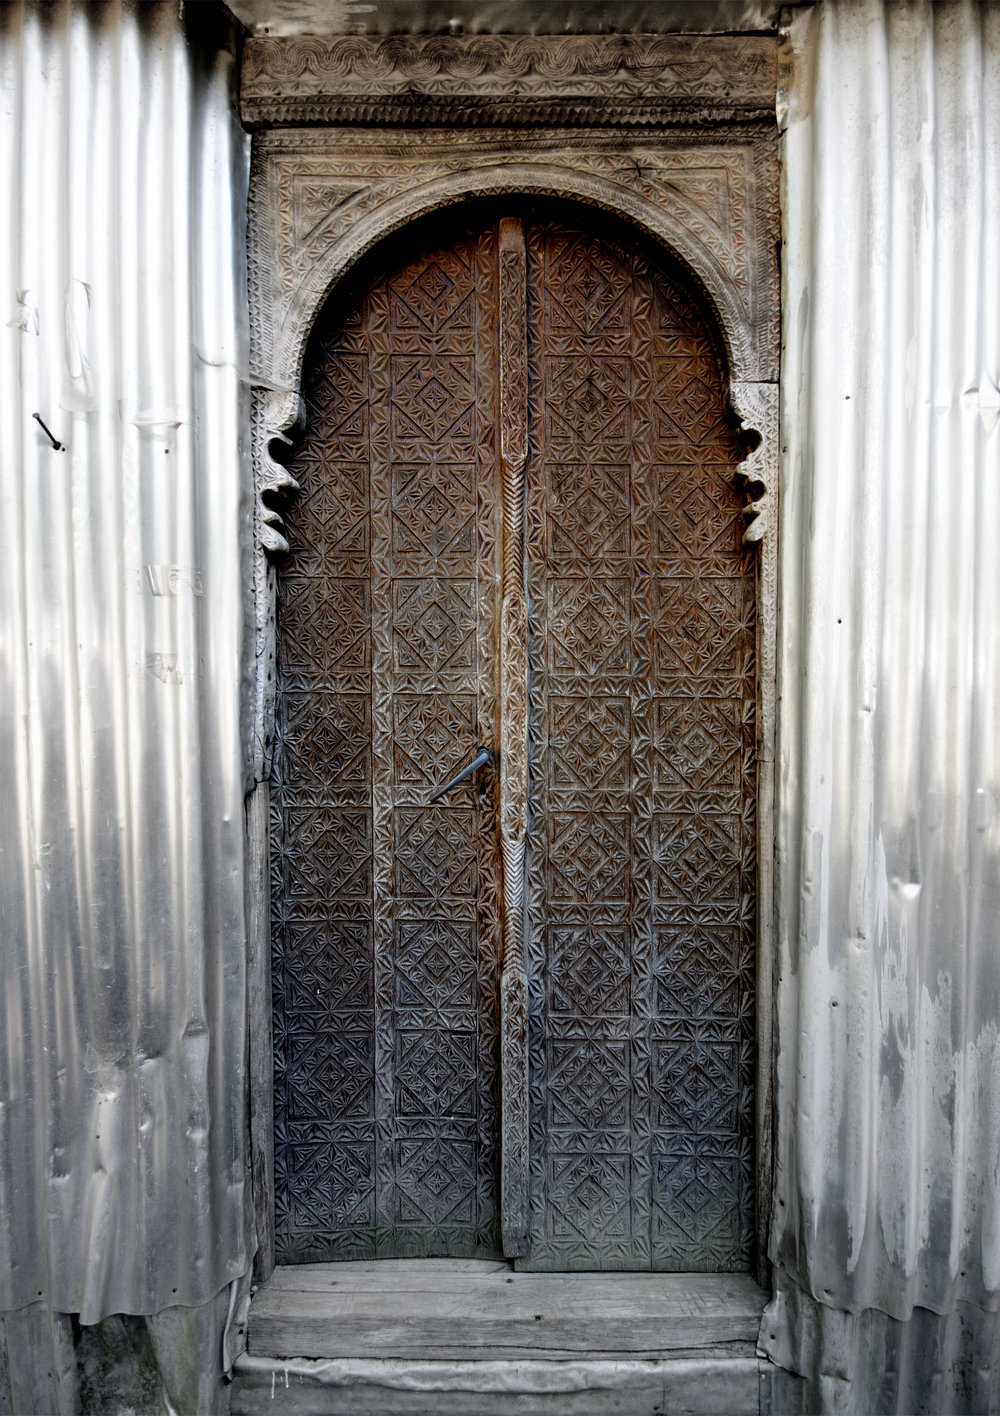 Akho (ახო) village mosque door detail